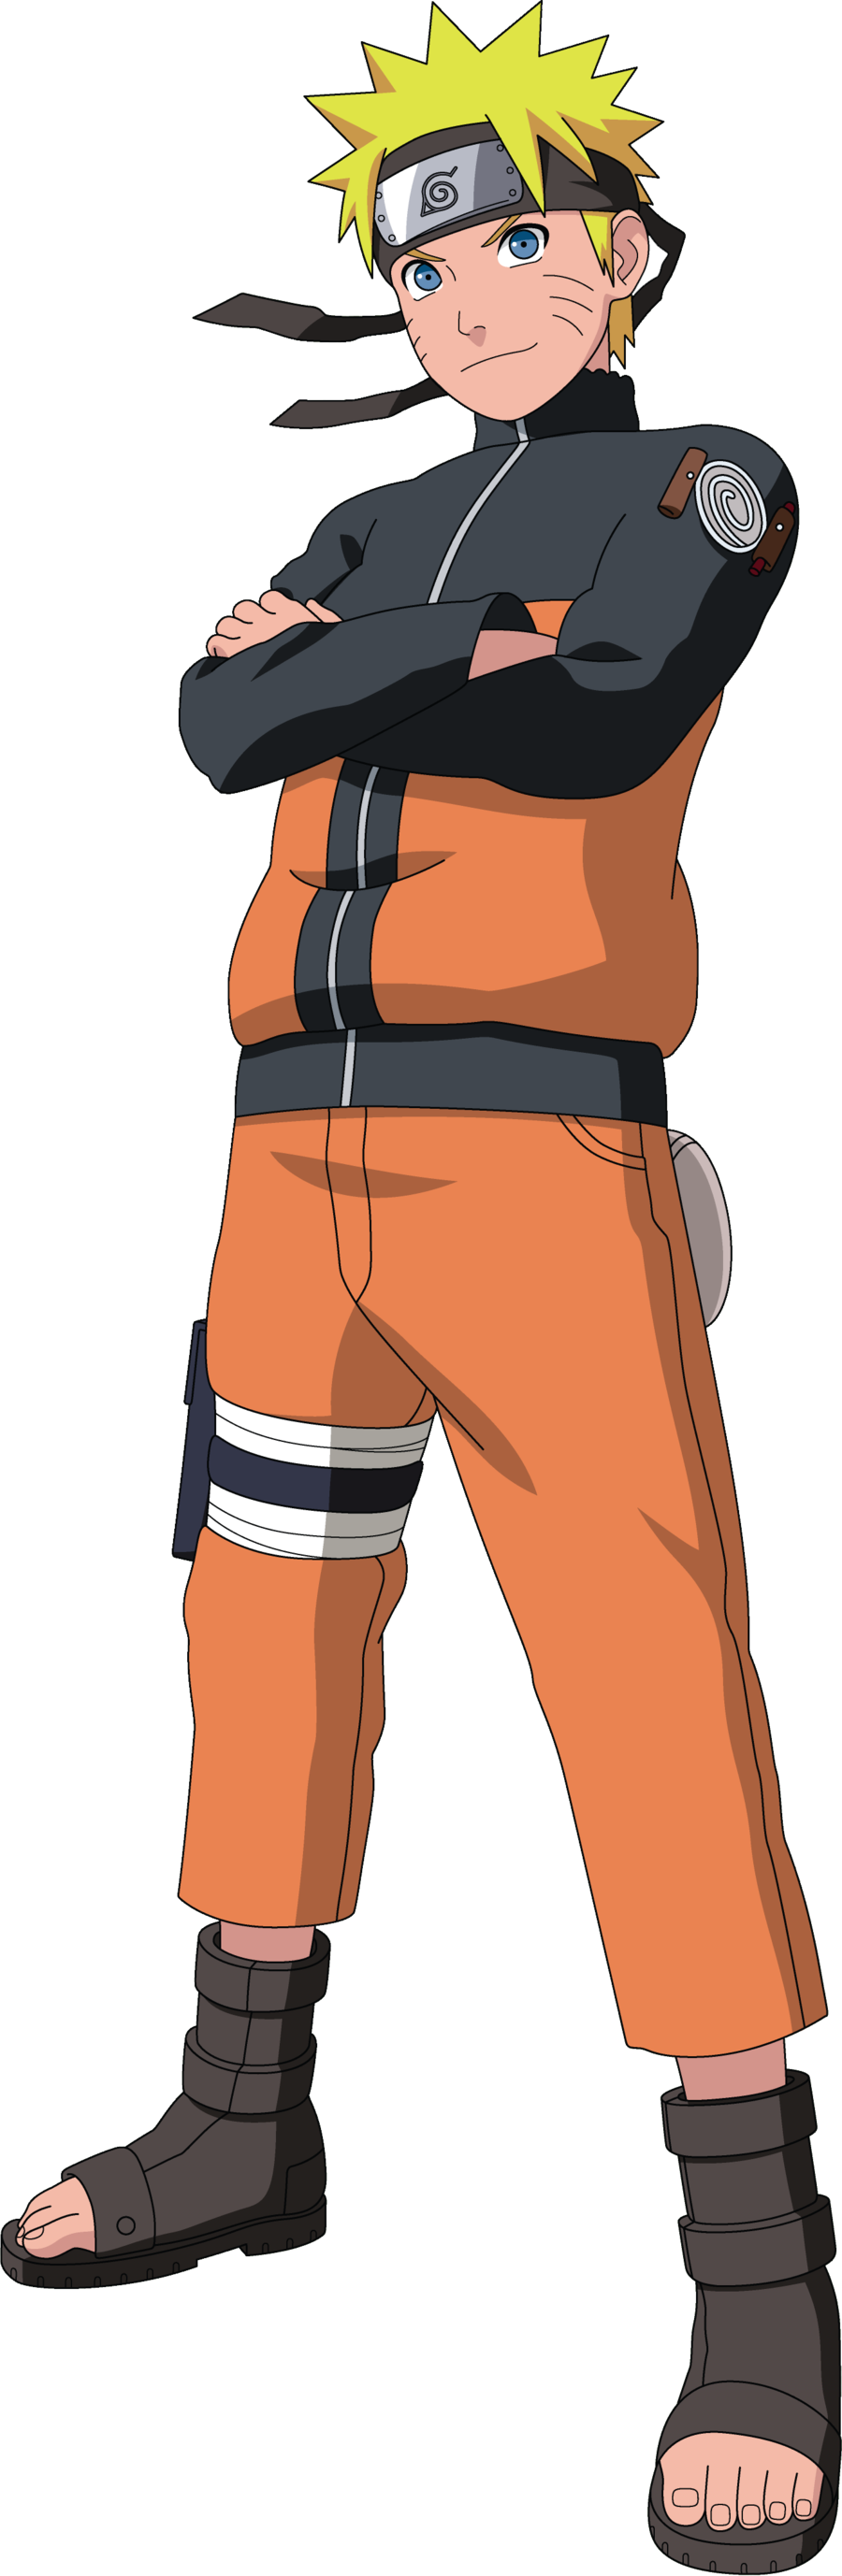 Naruto Uzumaki | DEATH BATTLE Wiki | FANDOM powered by Wikia